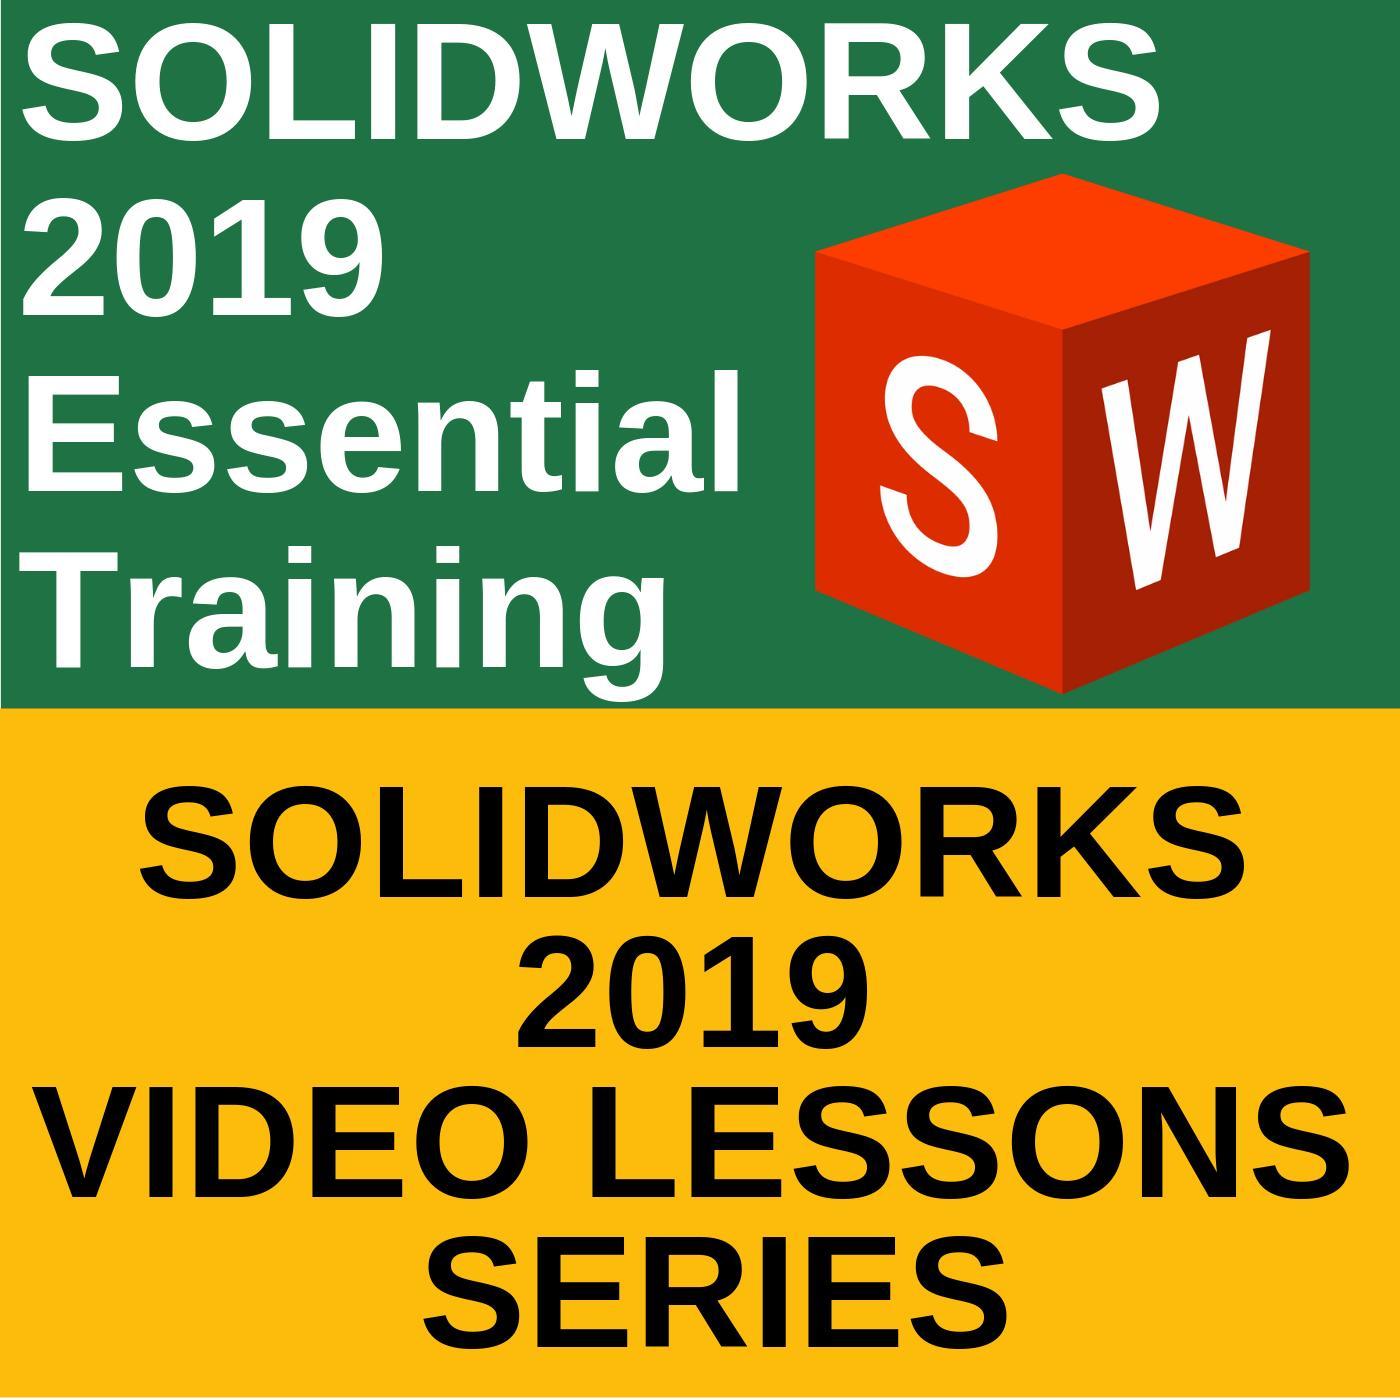 SOLIDWORKS Video Training - SOLIDWORKS 2019 Video Tutorials